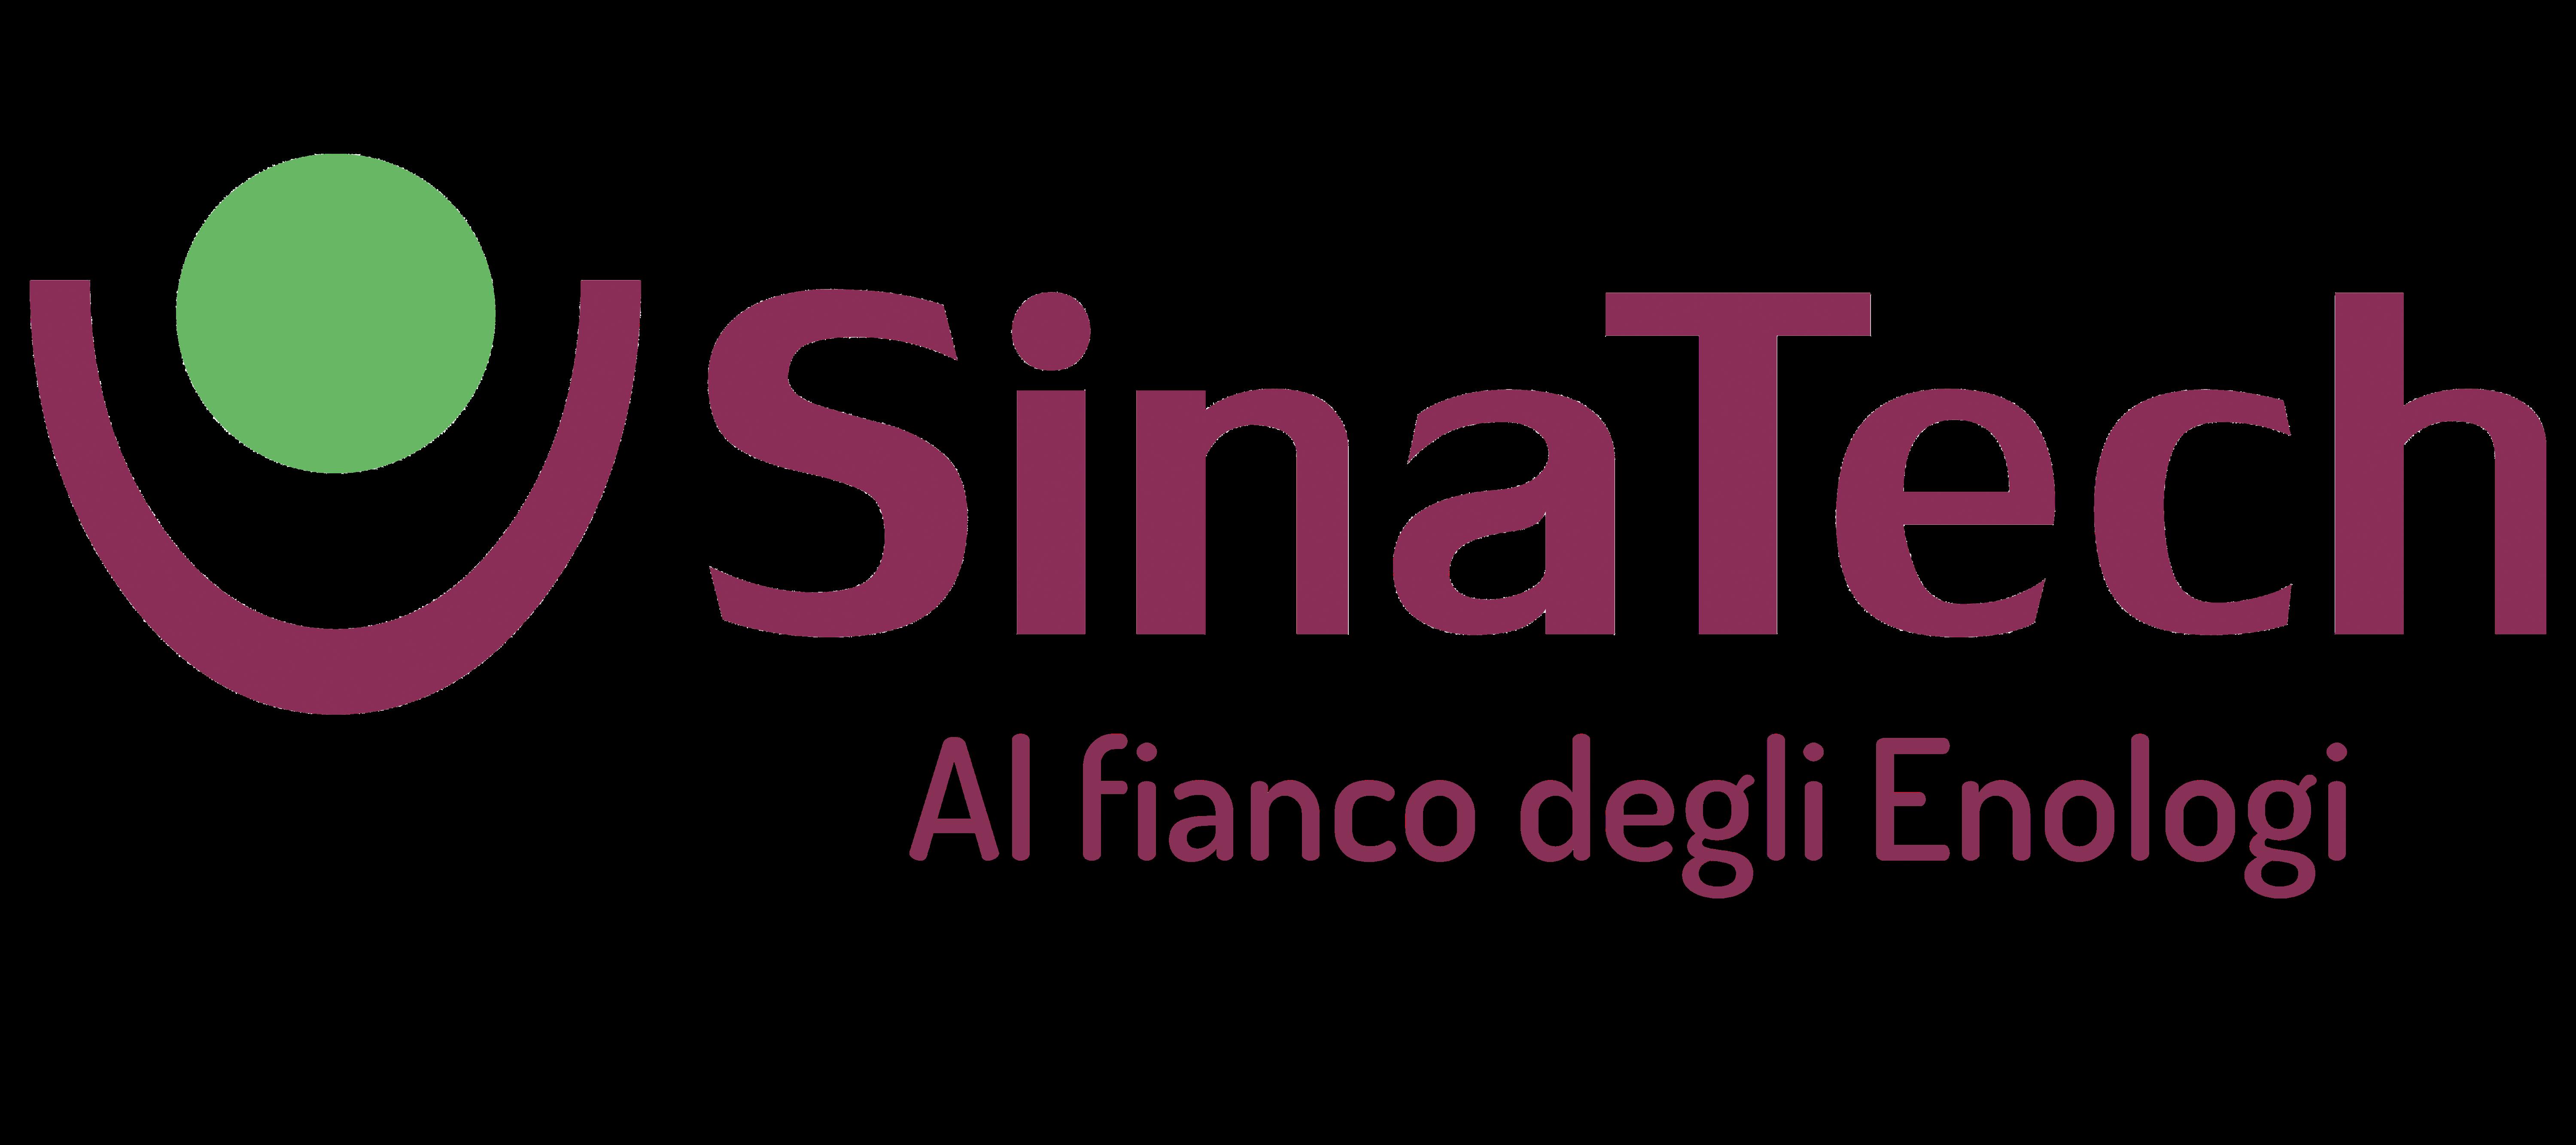 Logo con payoff - trasparente rid